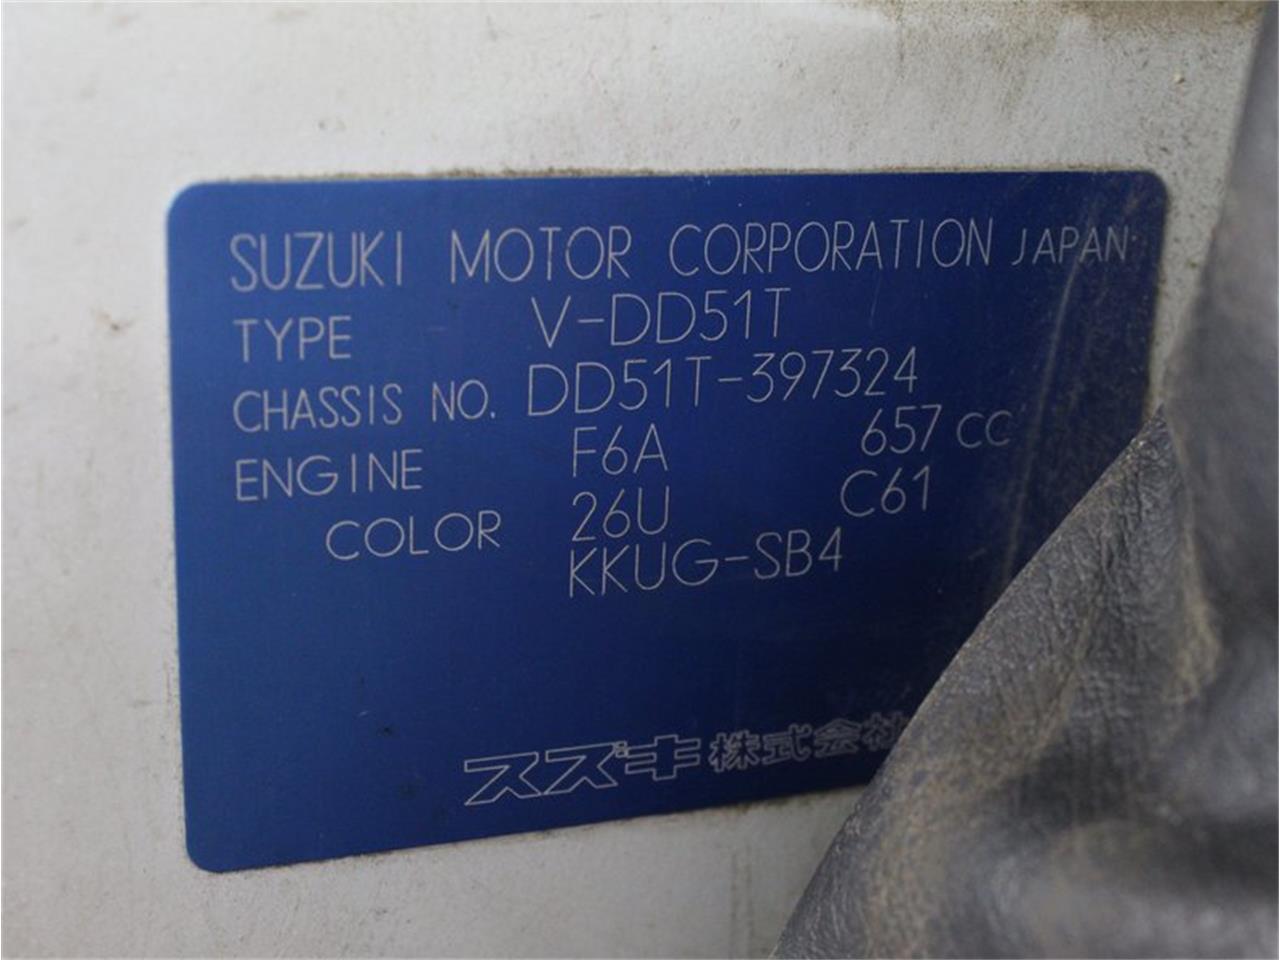 1995 Suzuki Carry (CC-1378441) for sale in Christiansburg, Virginia